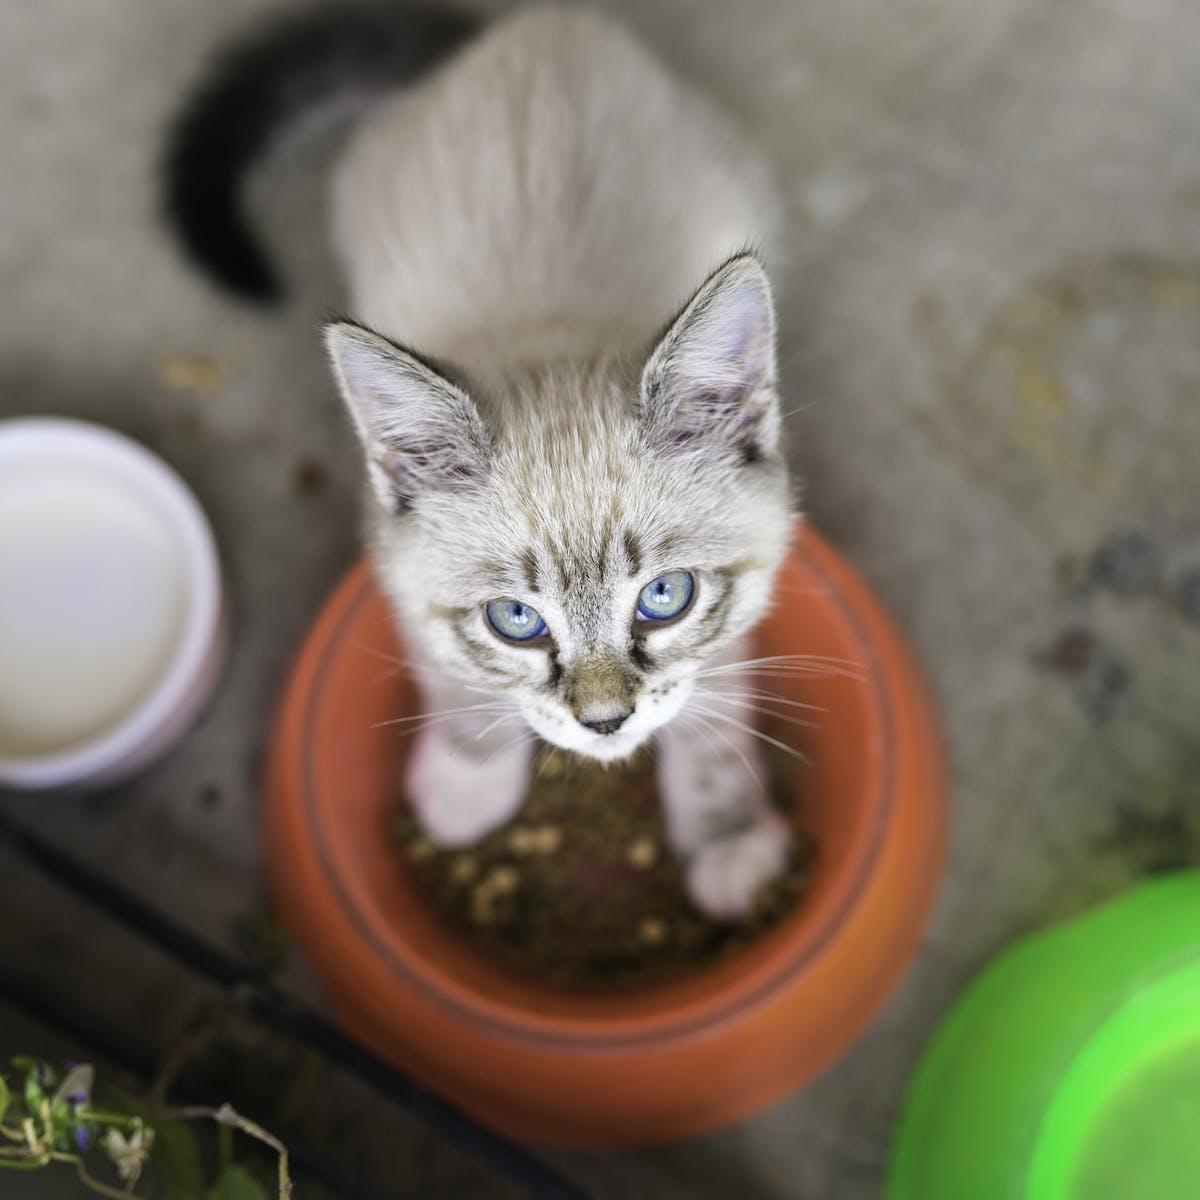 Senate inquiry calls for tougher rules on pet food in Australia